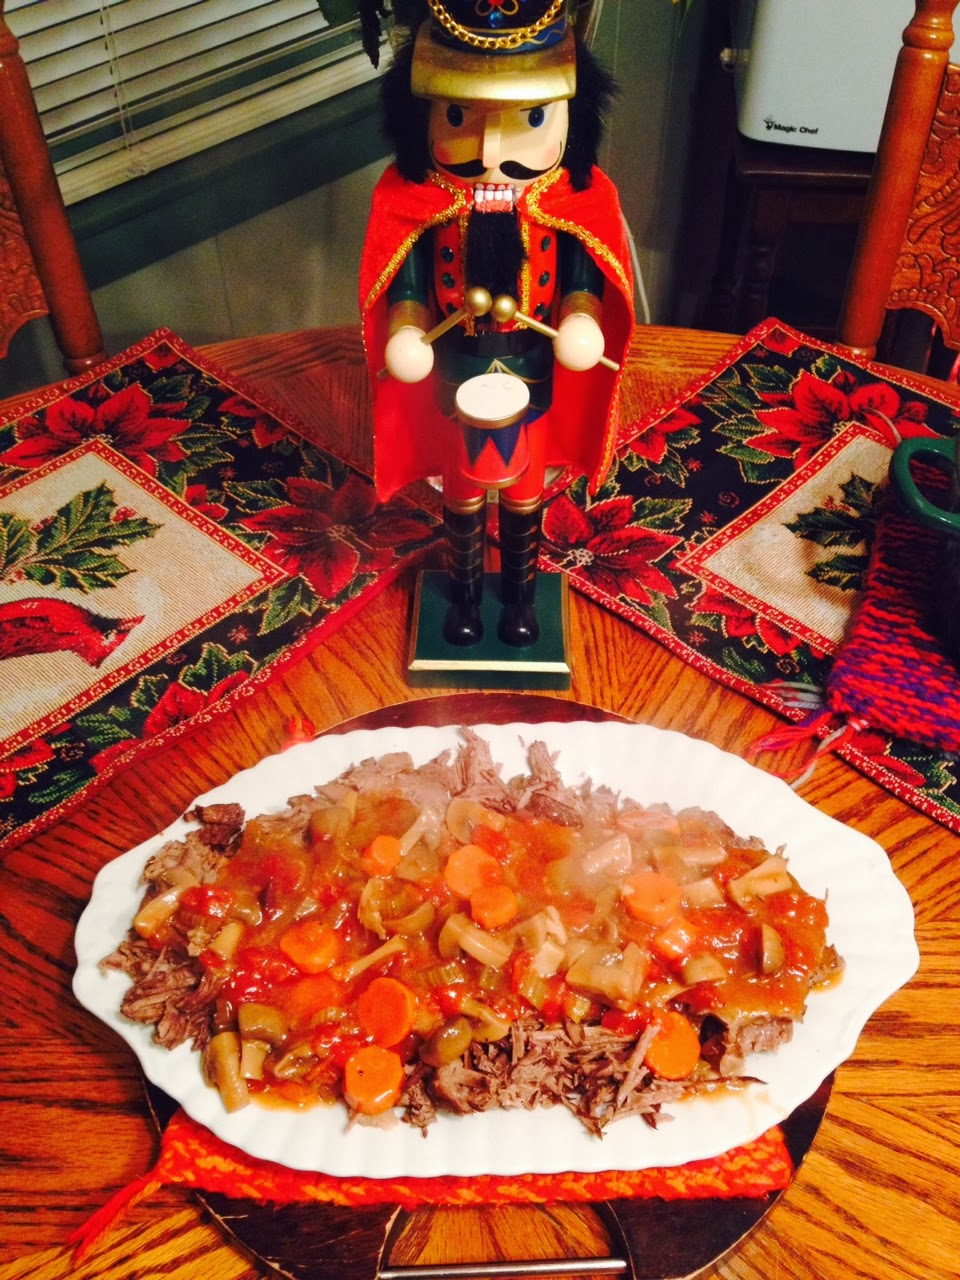 ... Capers: Oven Braised Italian Style Pot Roast Over Creamy Polenta